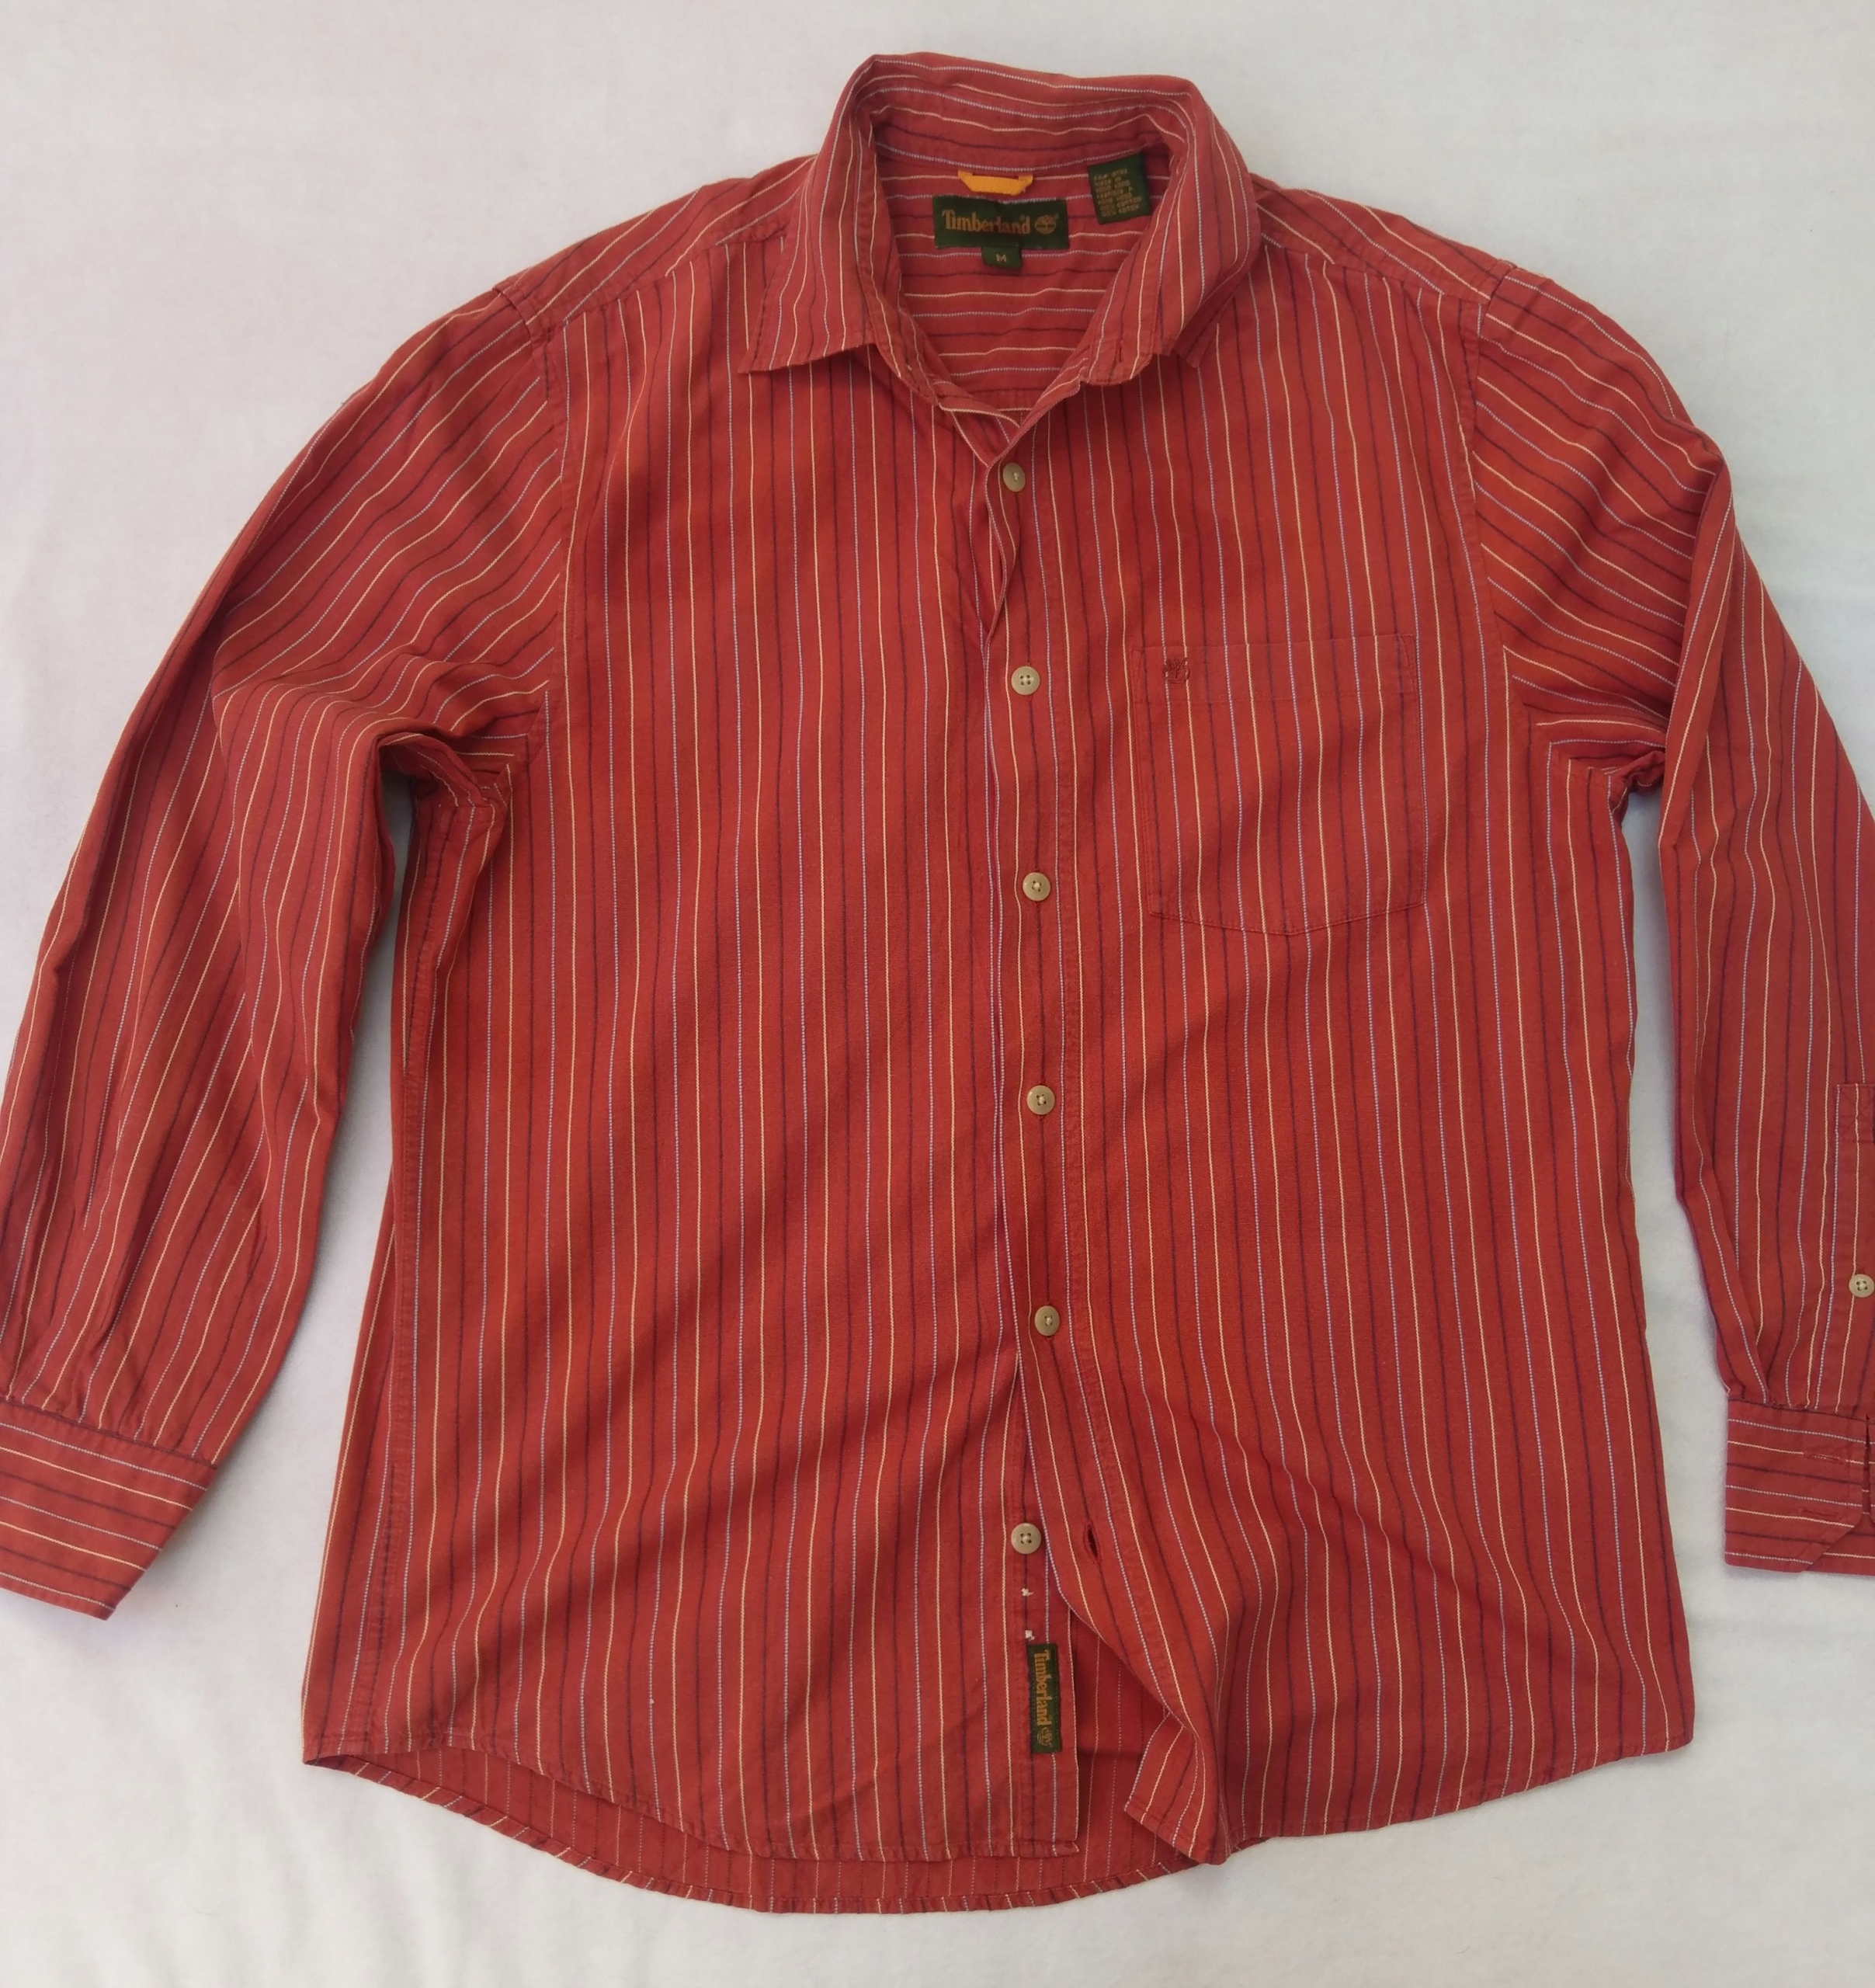 Koszula męska Timberland